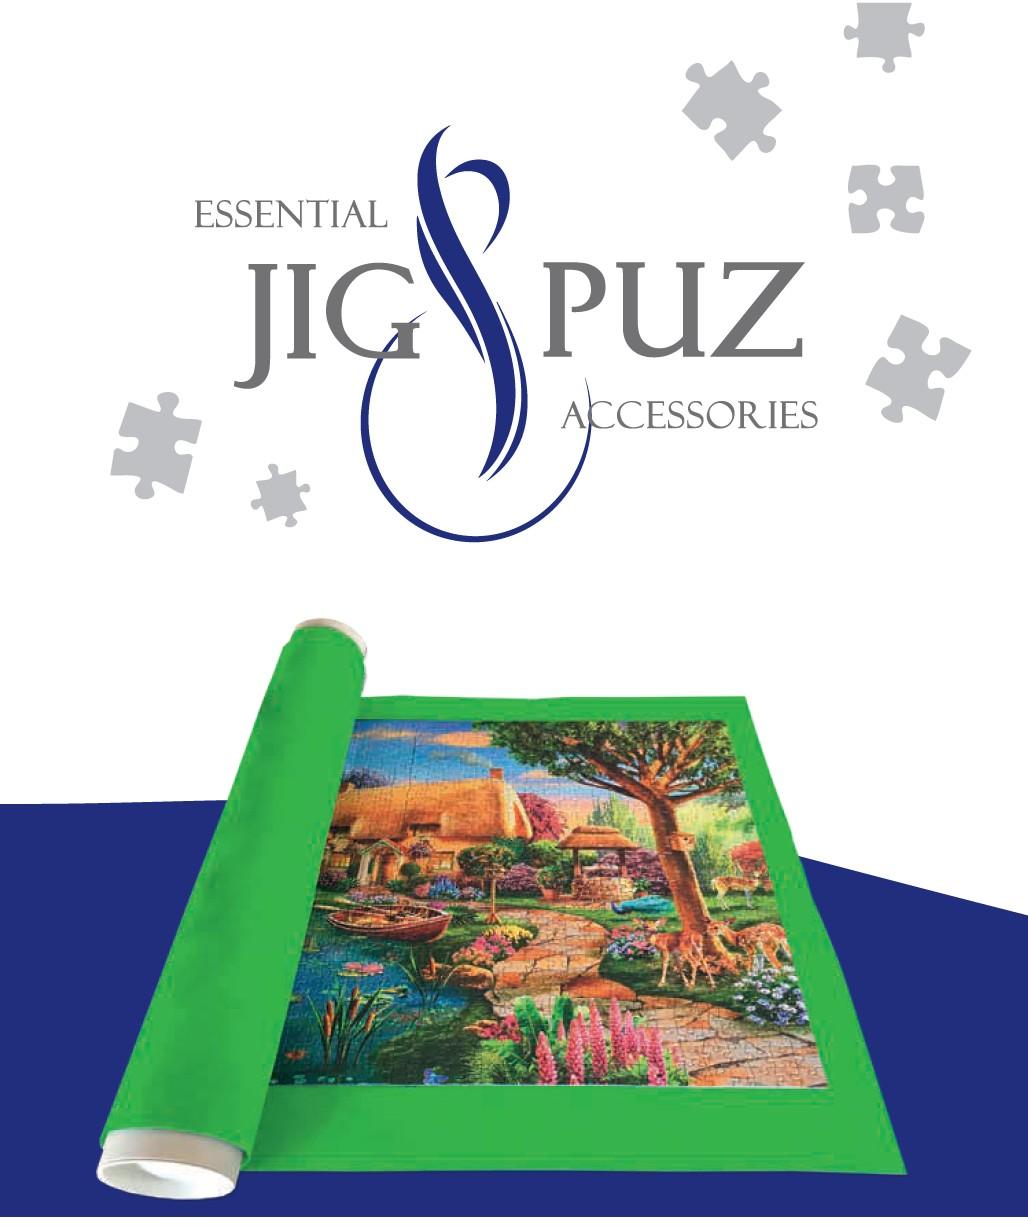 http://data.my-puzzle.fr/jig-and-puz.185/jig-puz-tapis-de-puzzles-300-a-1000-pieces.79724-1.fs.jpg